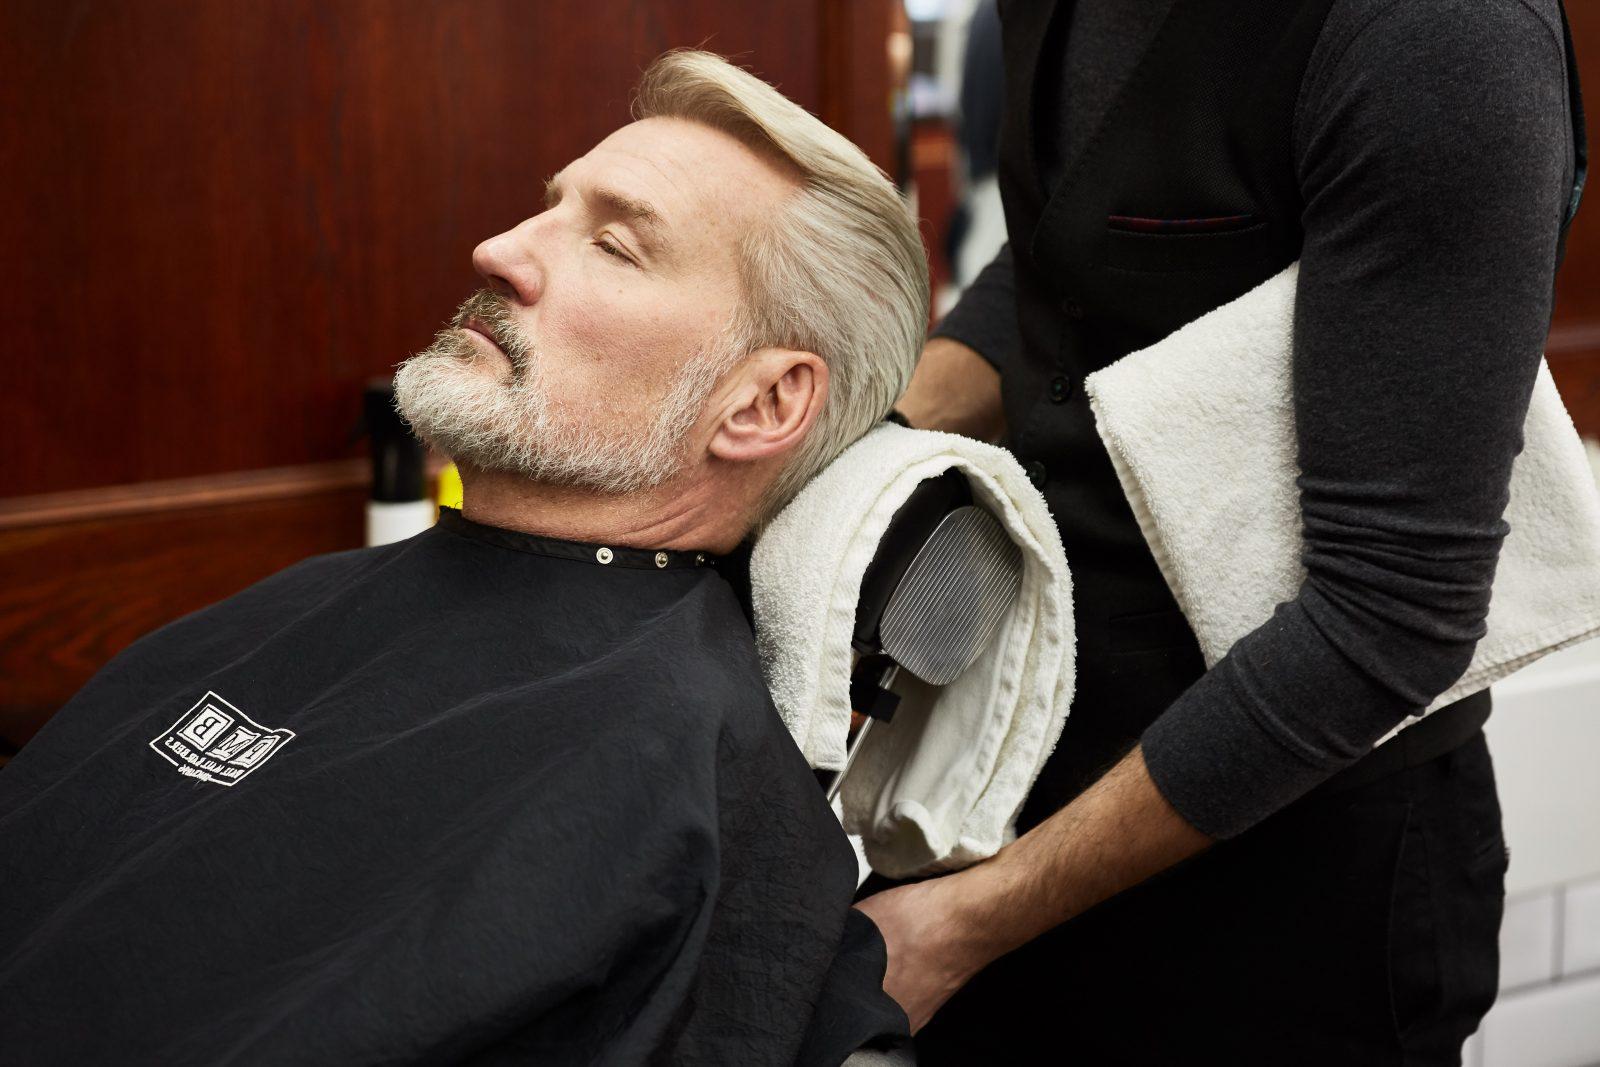 Barbers Victoria